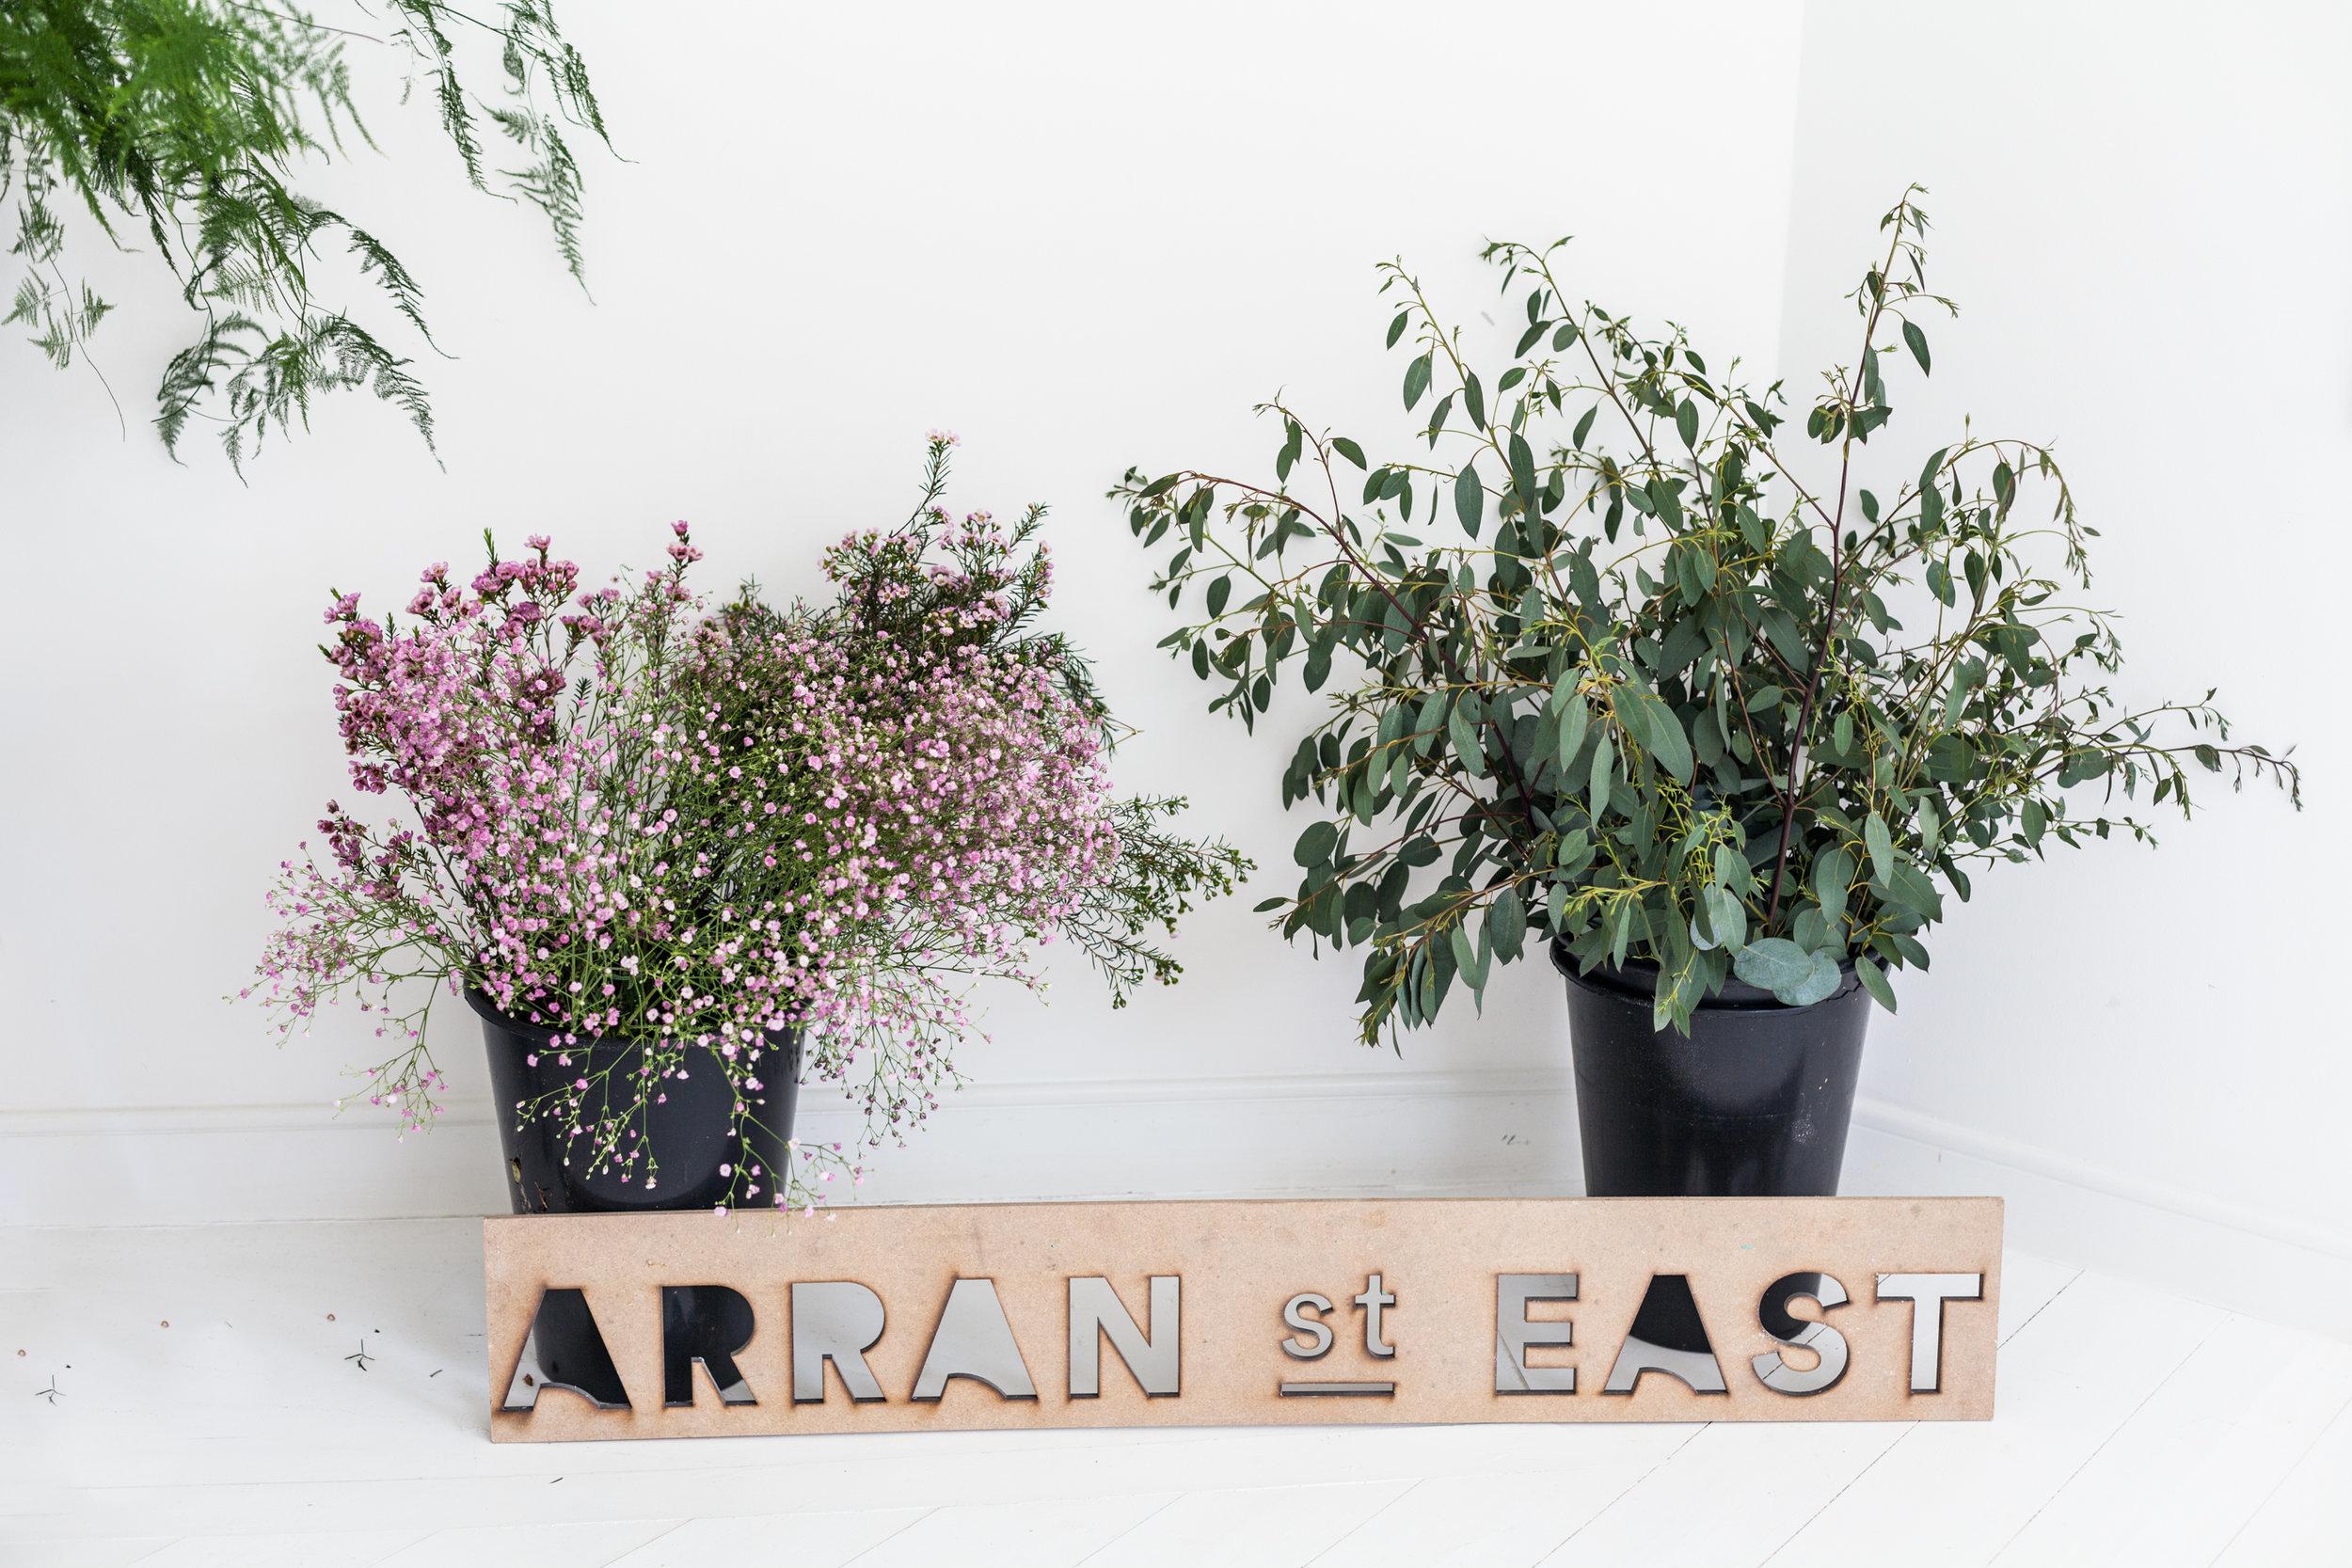 Arran Street East Floral Workshop_Images by Alex Louviers.jpg